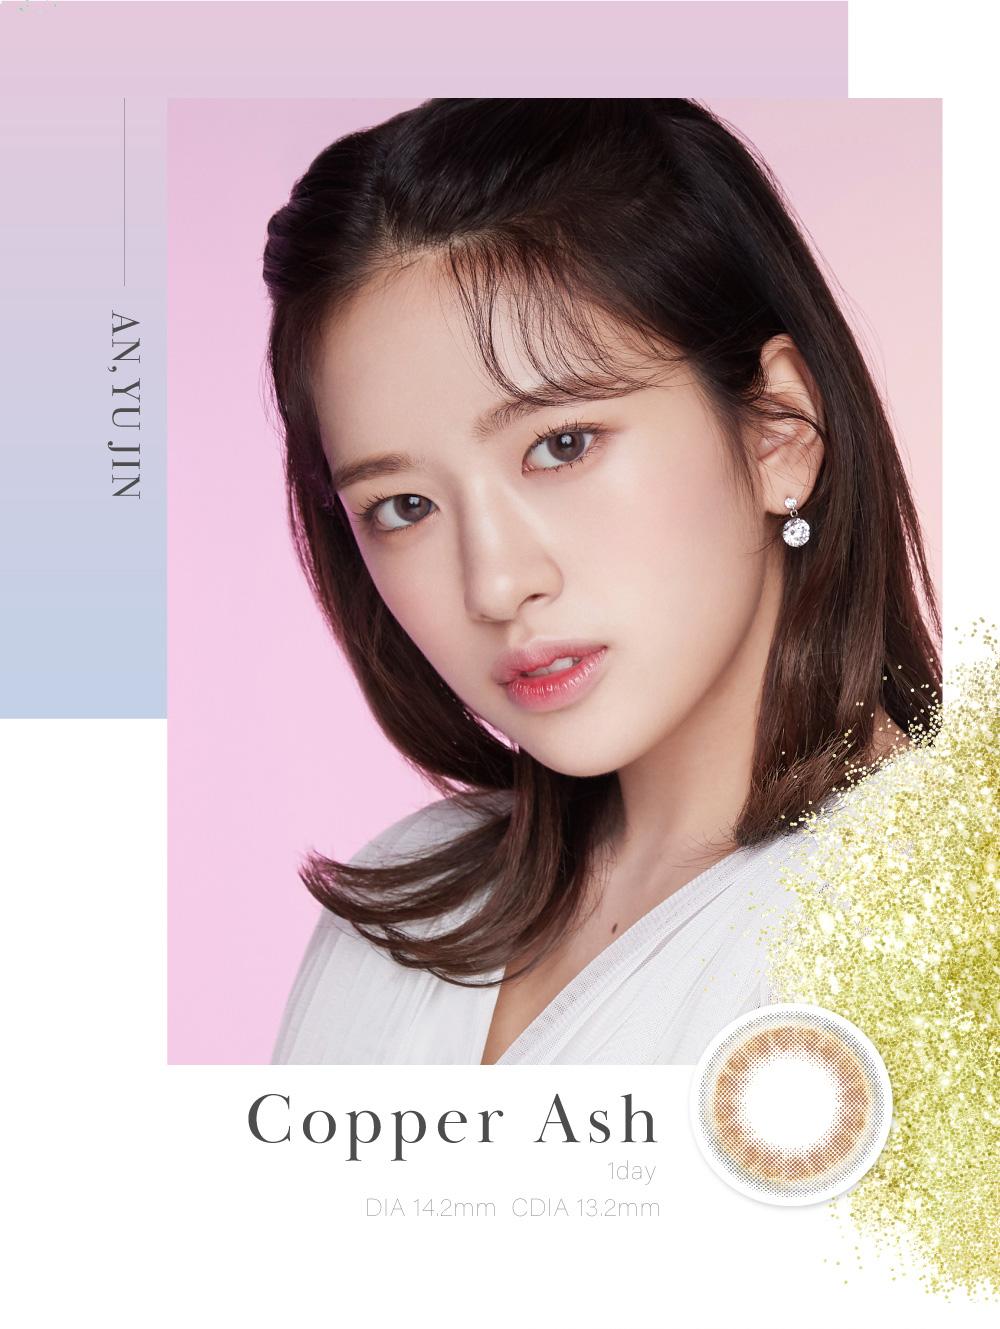 【Copper Ashカッパーアッシュ】Miche Bloomin' 1Day Iris Grow Series ミッシュブルーミンワンデーアイリスグローシリーズ